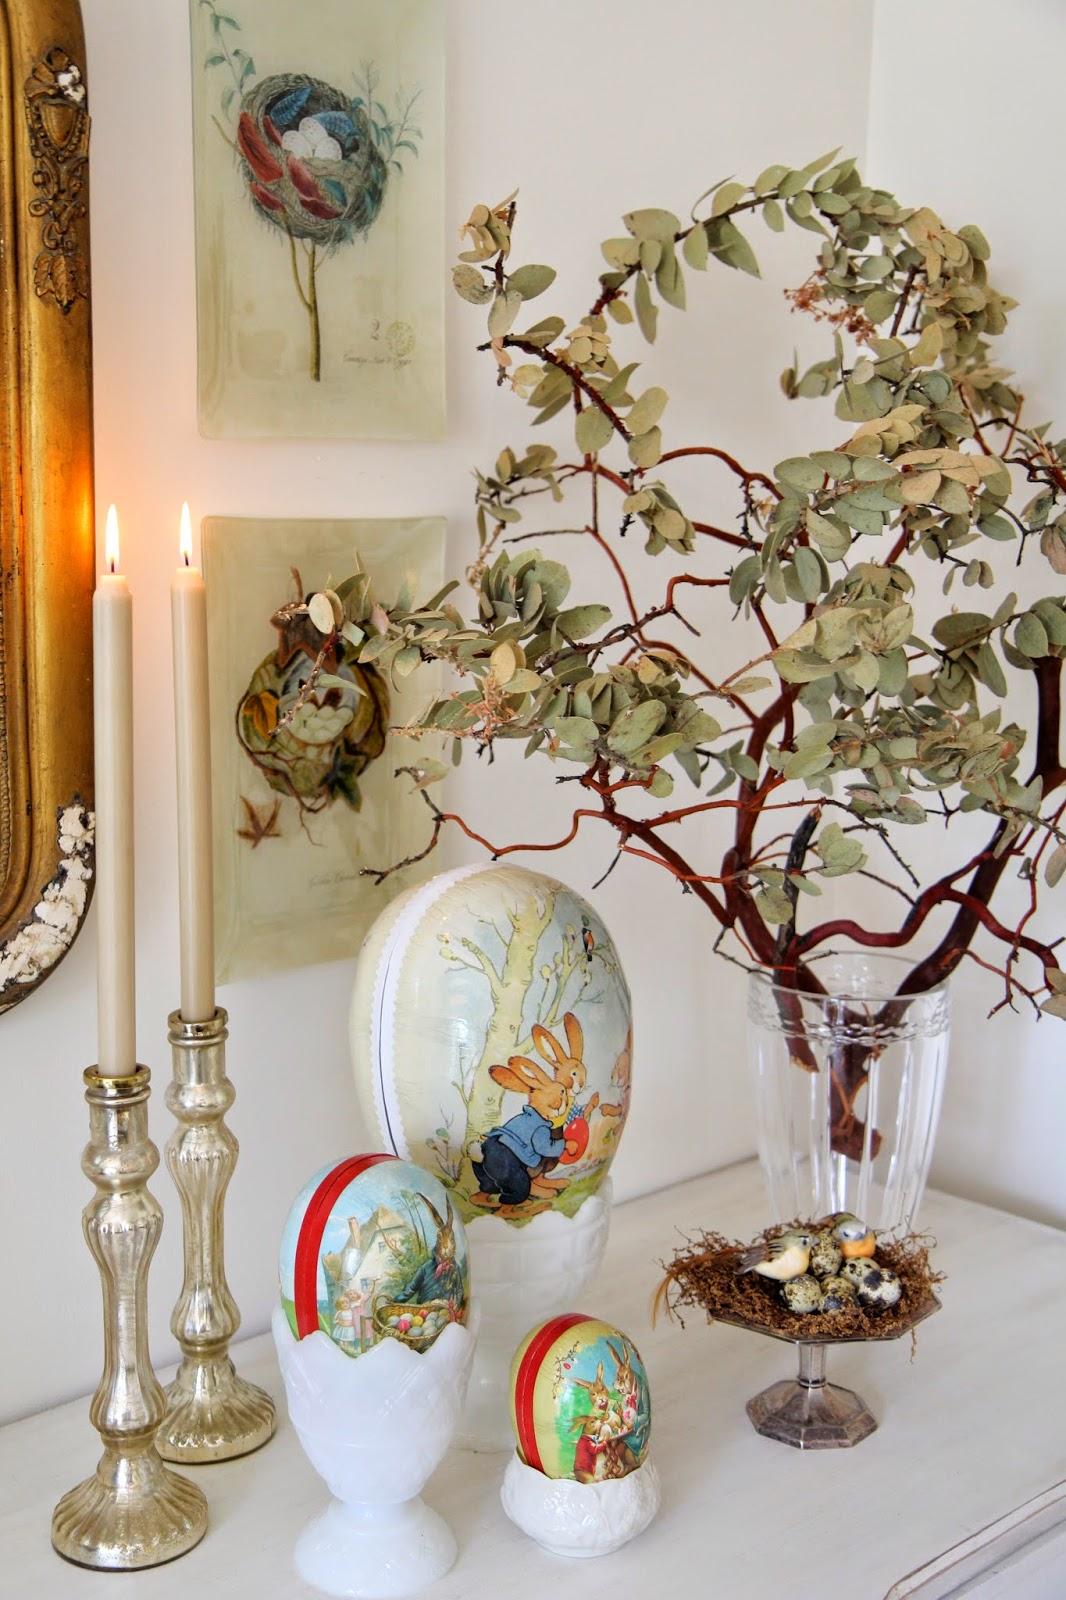 Cardboard eggs; Easter Buffet Table Decor - Nora's Nest